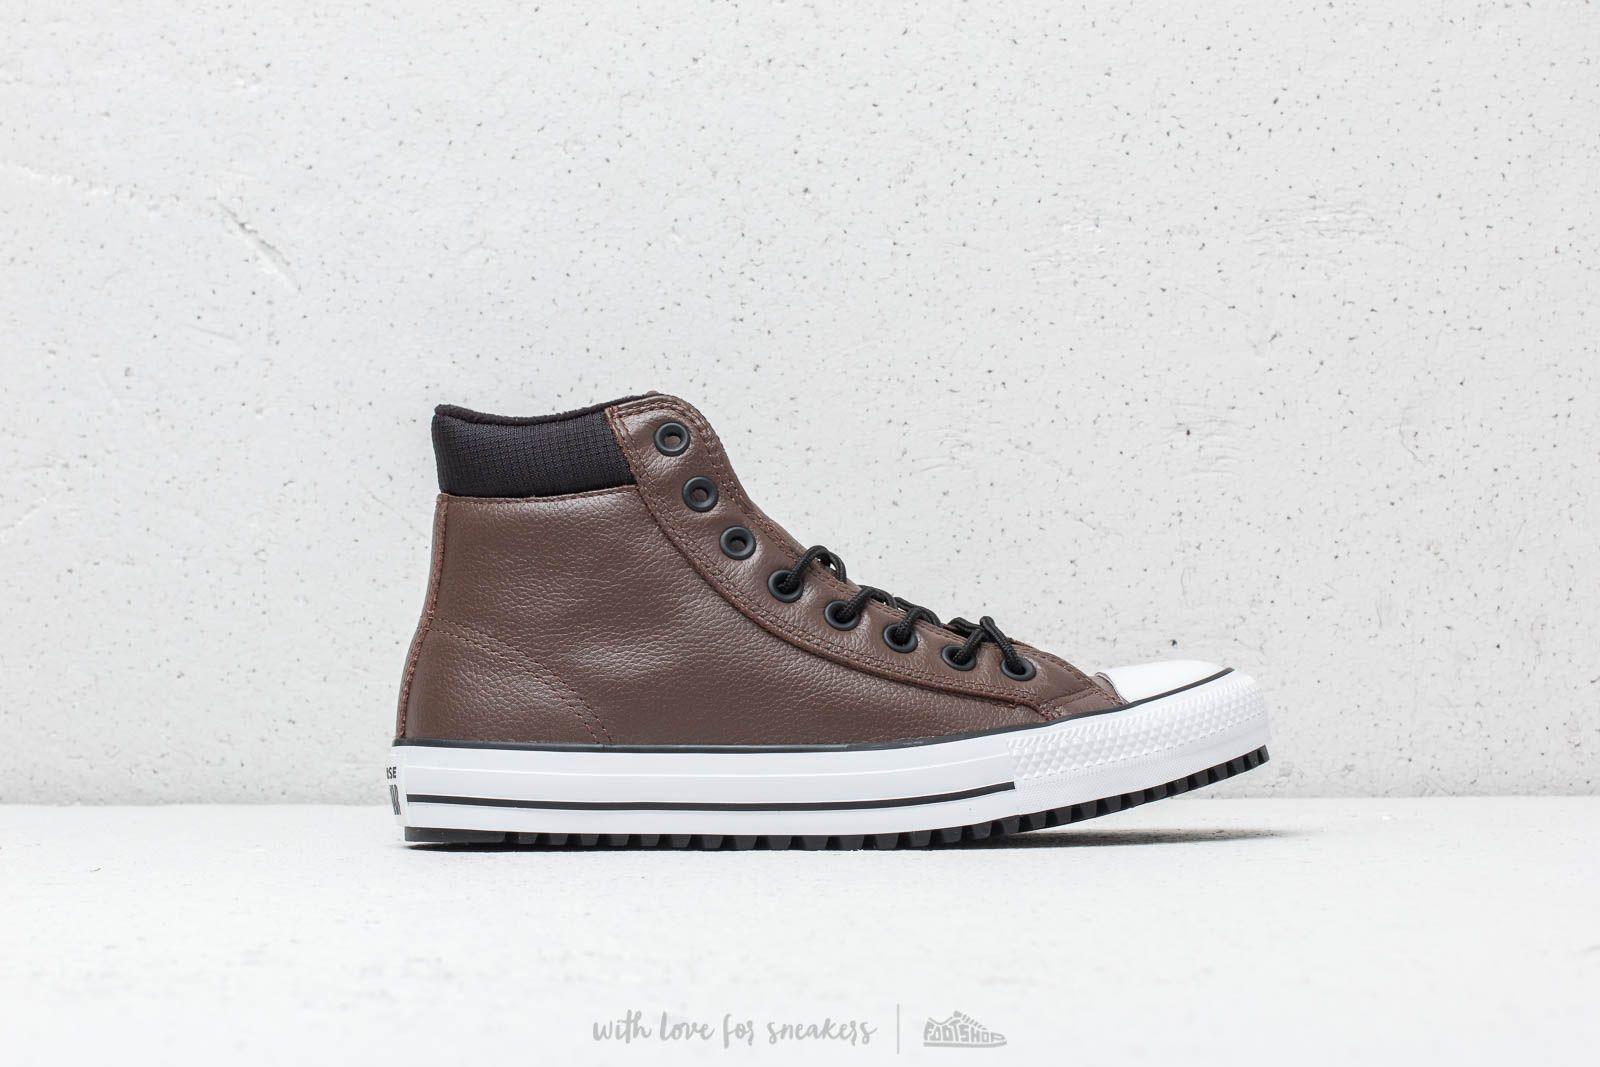 Star Hi Black Boot White Converse All Pc Chuck Taylor Chocolate 5uFJTlcK13